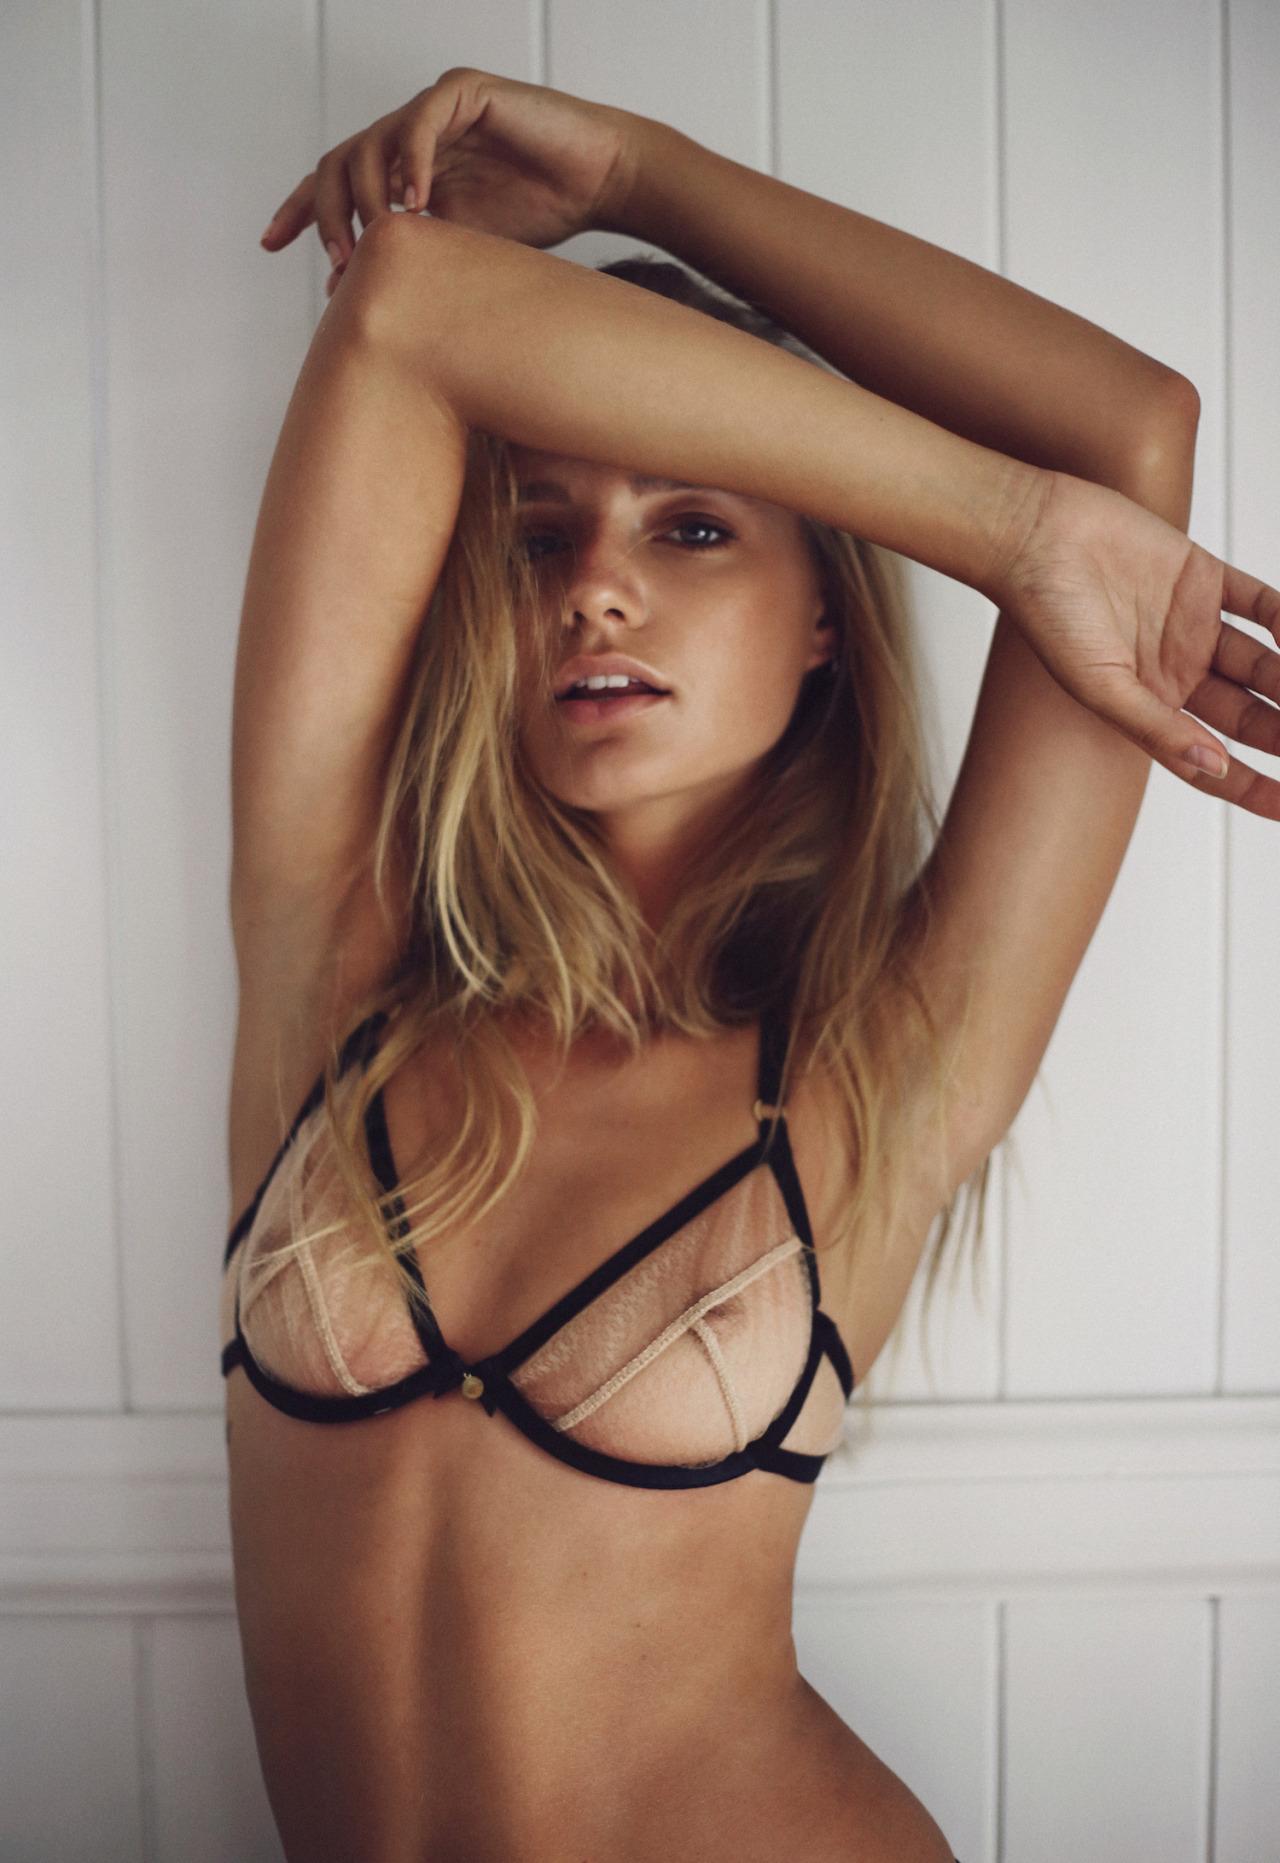 Tits Maya Stepper naked (85 photos), Ass, Paparazzi, Feet, braless 2018